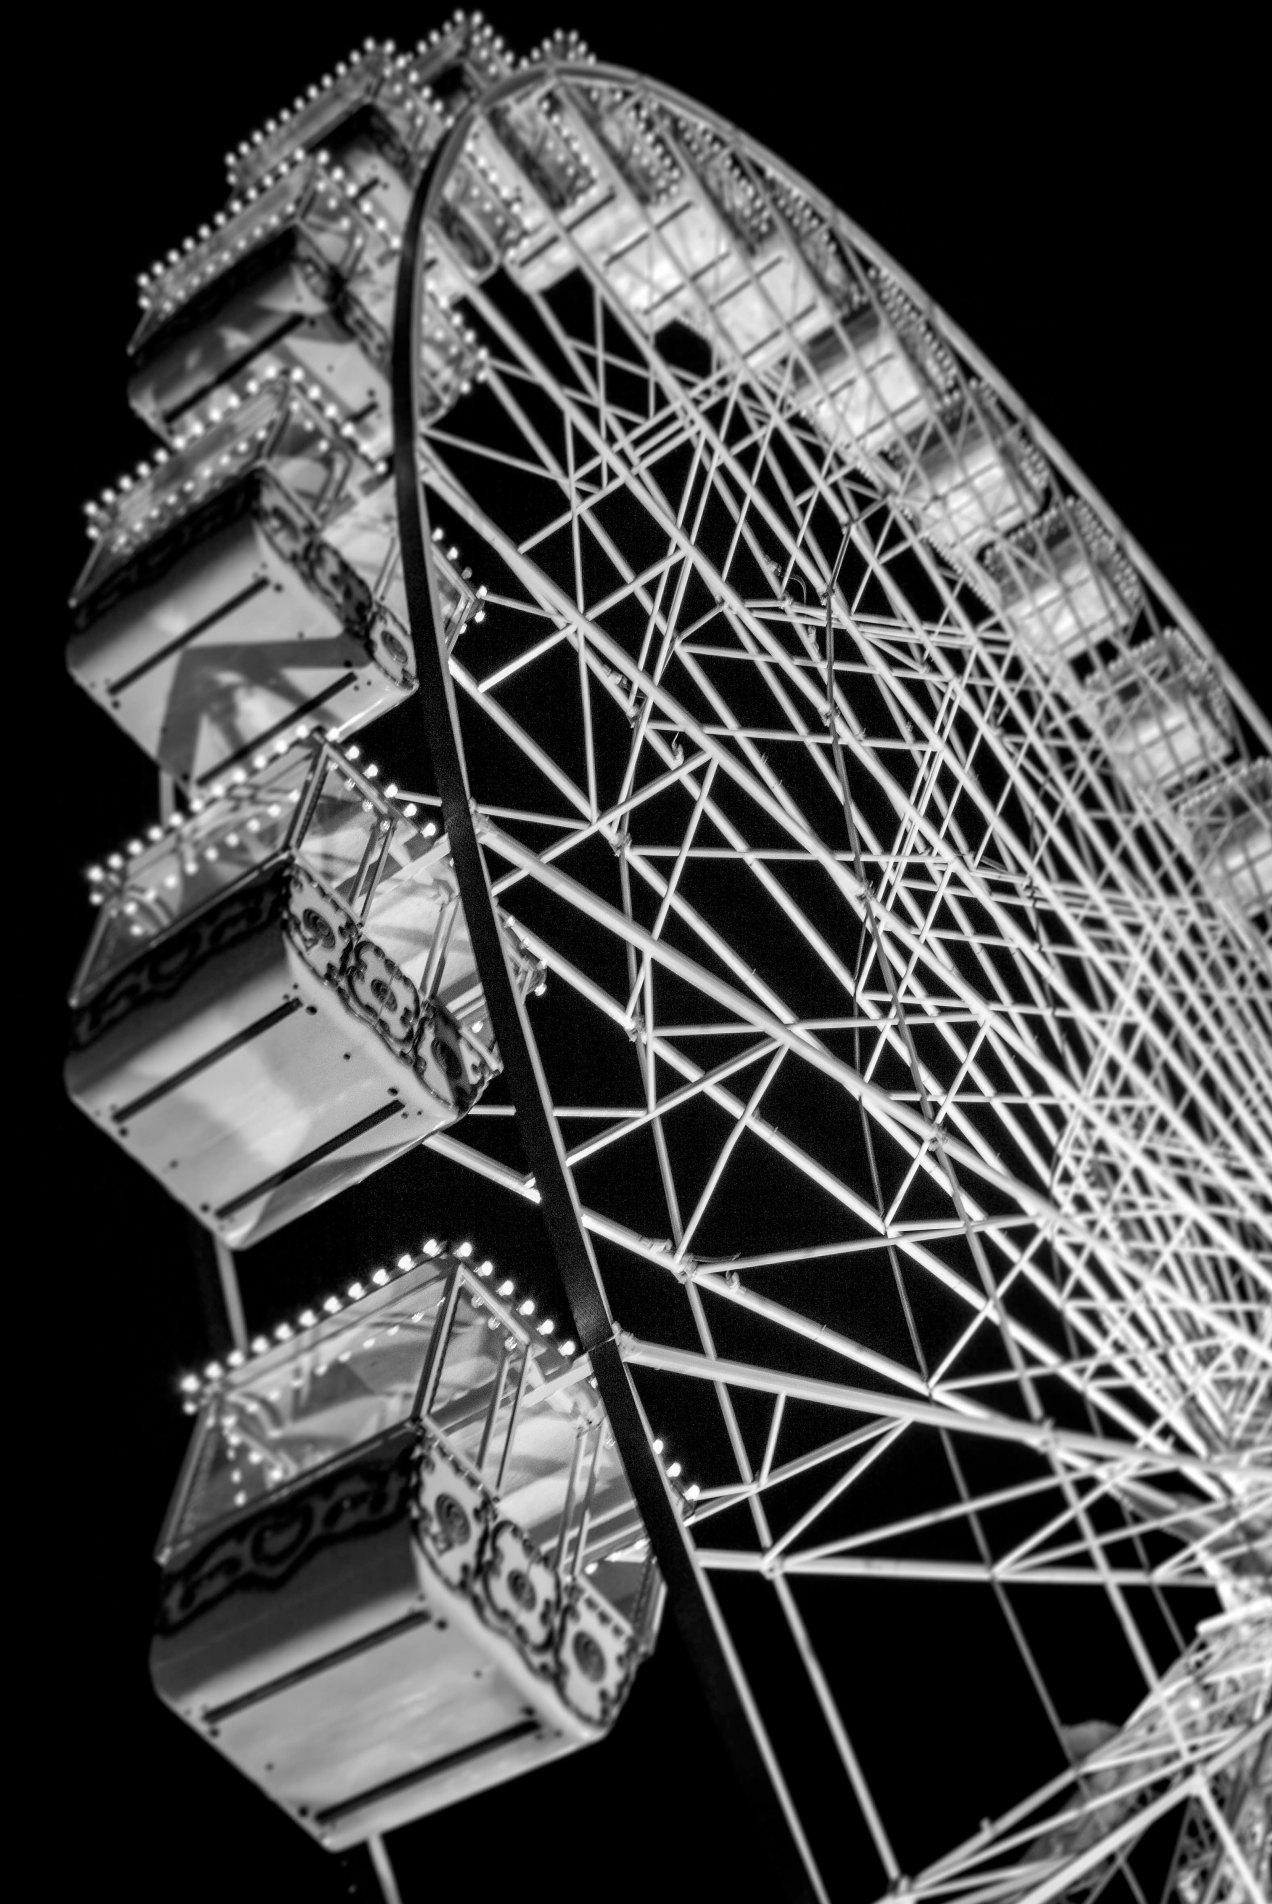 Grand roue, Nice, gildalliere, 2018